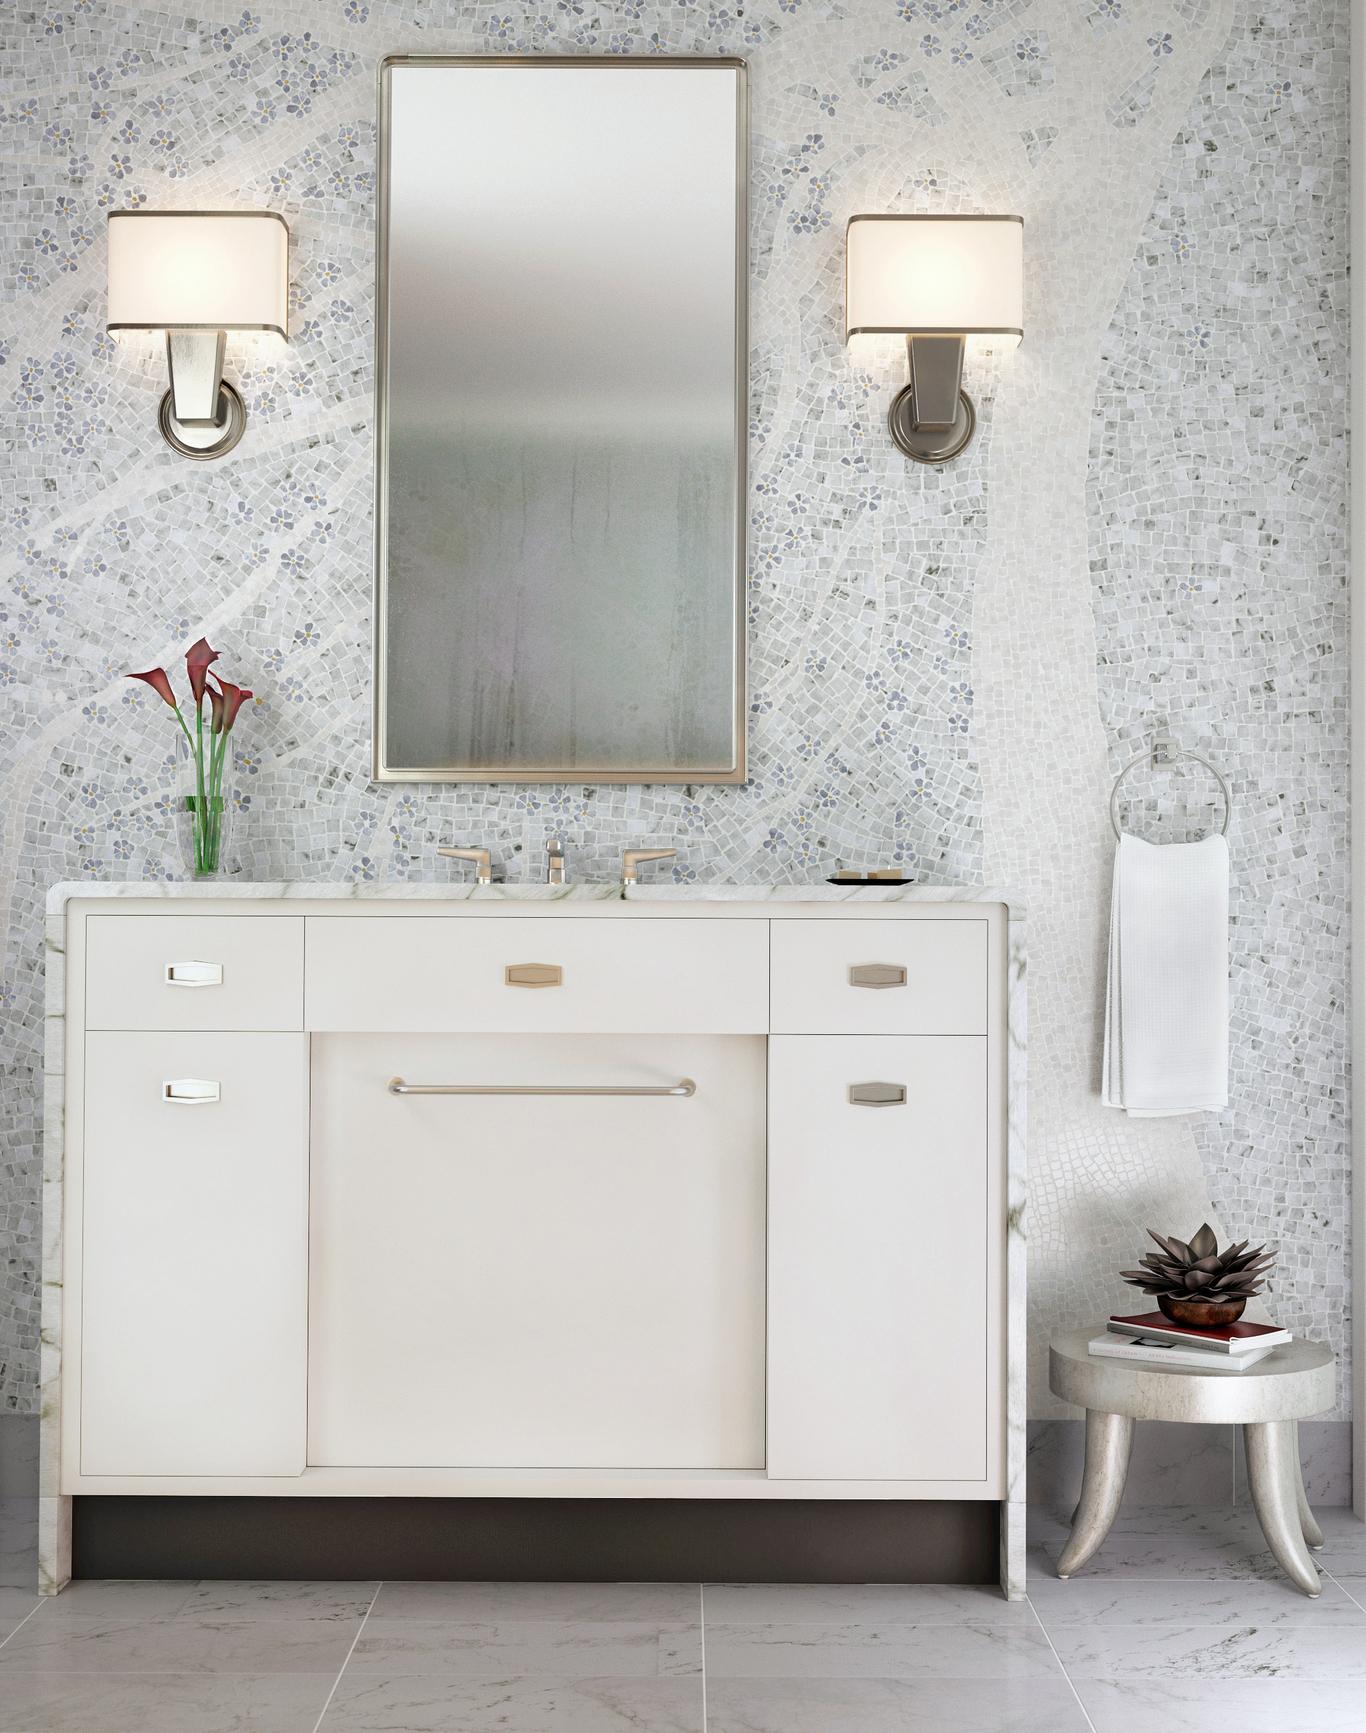 Darkblood bathroom 1 f89c8568 v52f